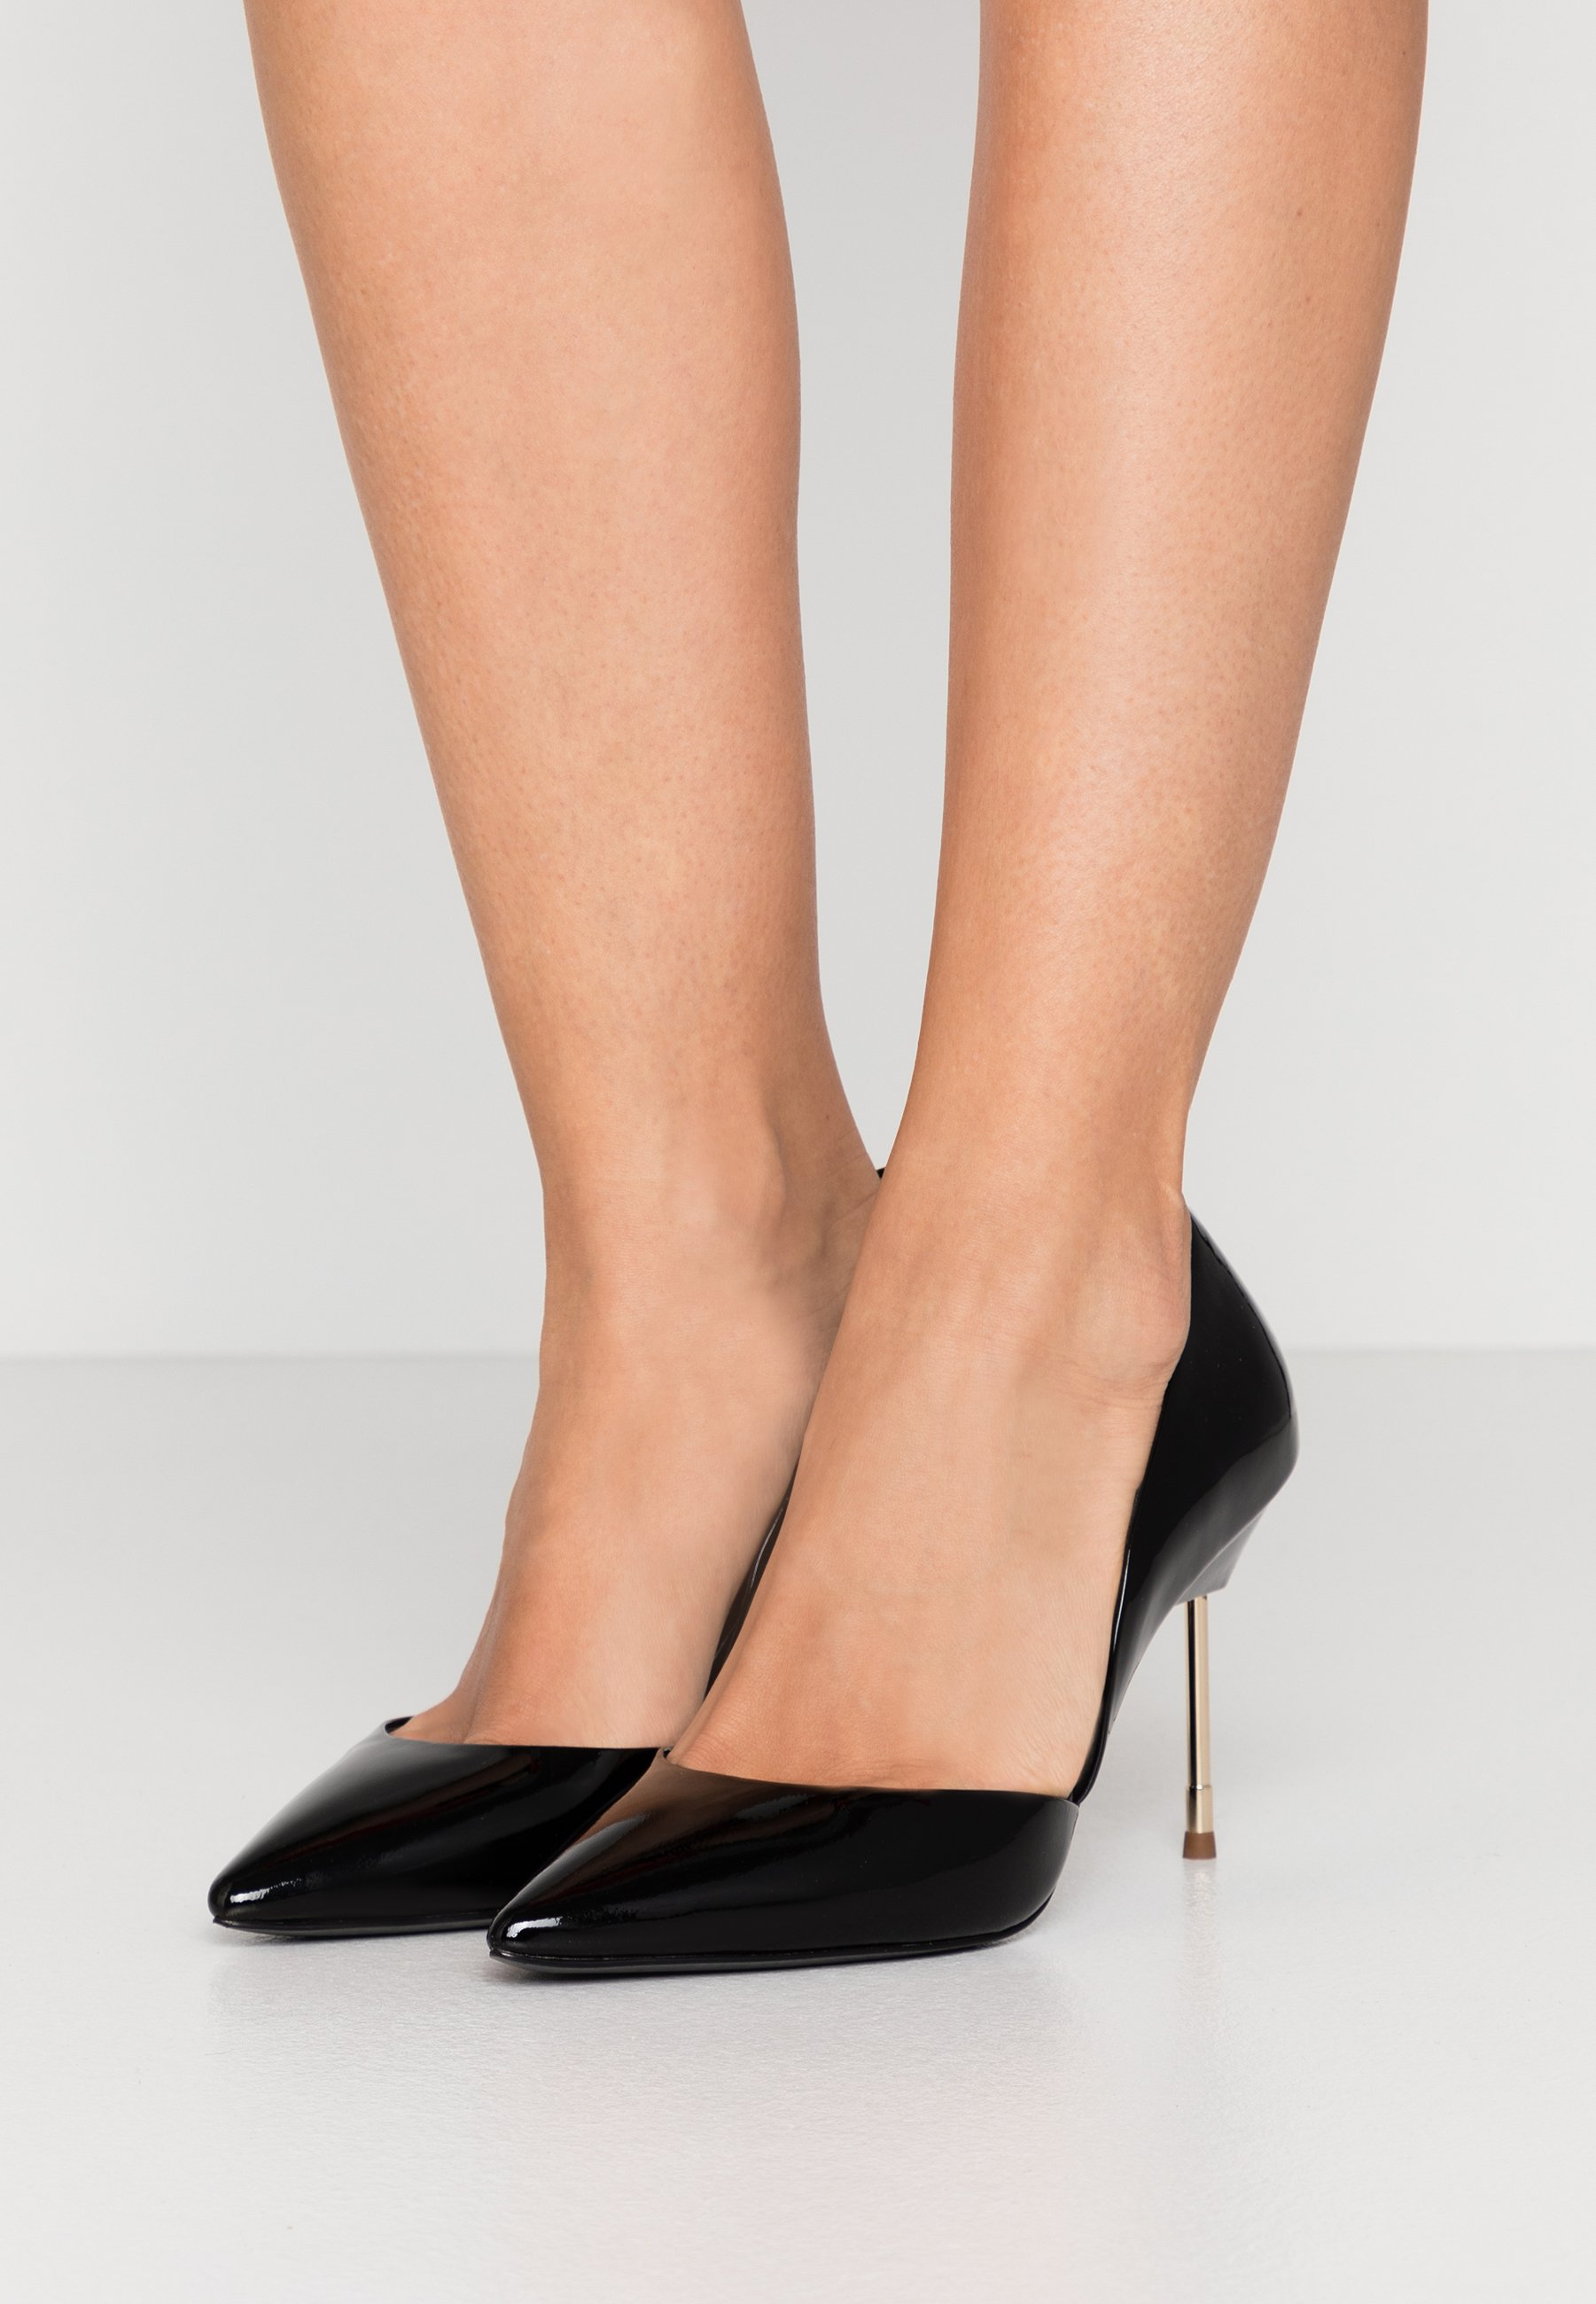 Kurt Geiger London BOND  - Escarpins à talons hauts - black - Chaussures à talons femme Original